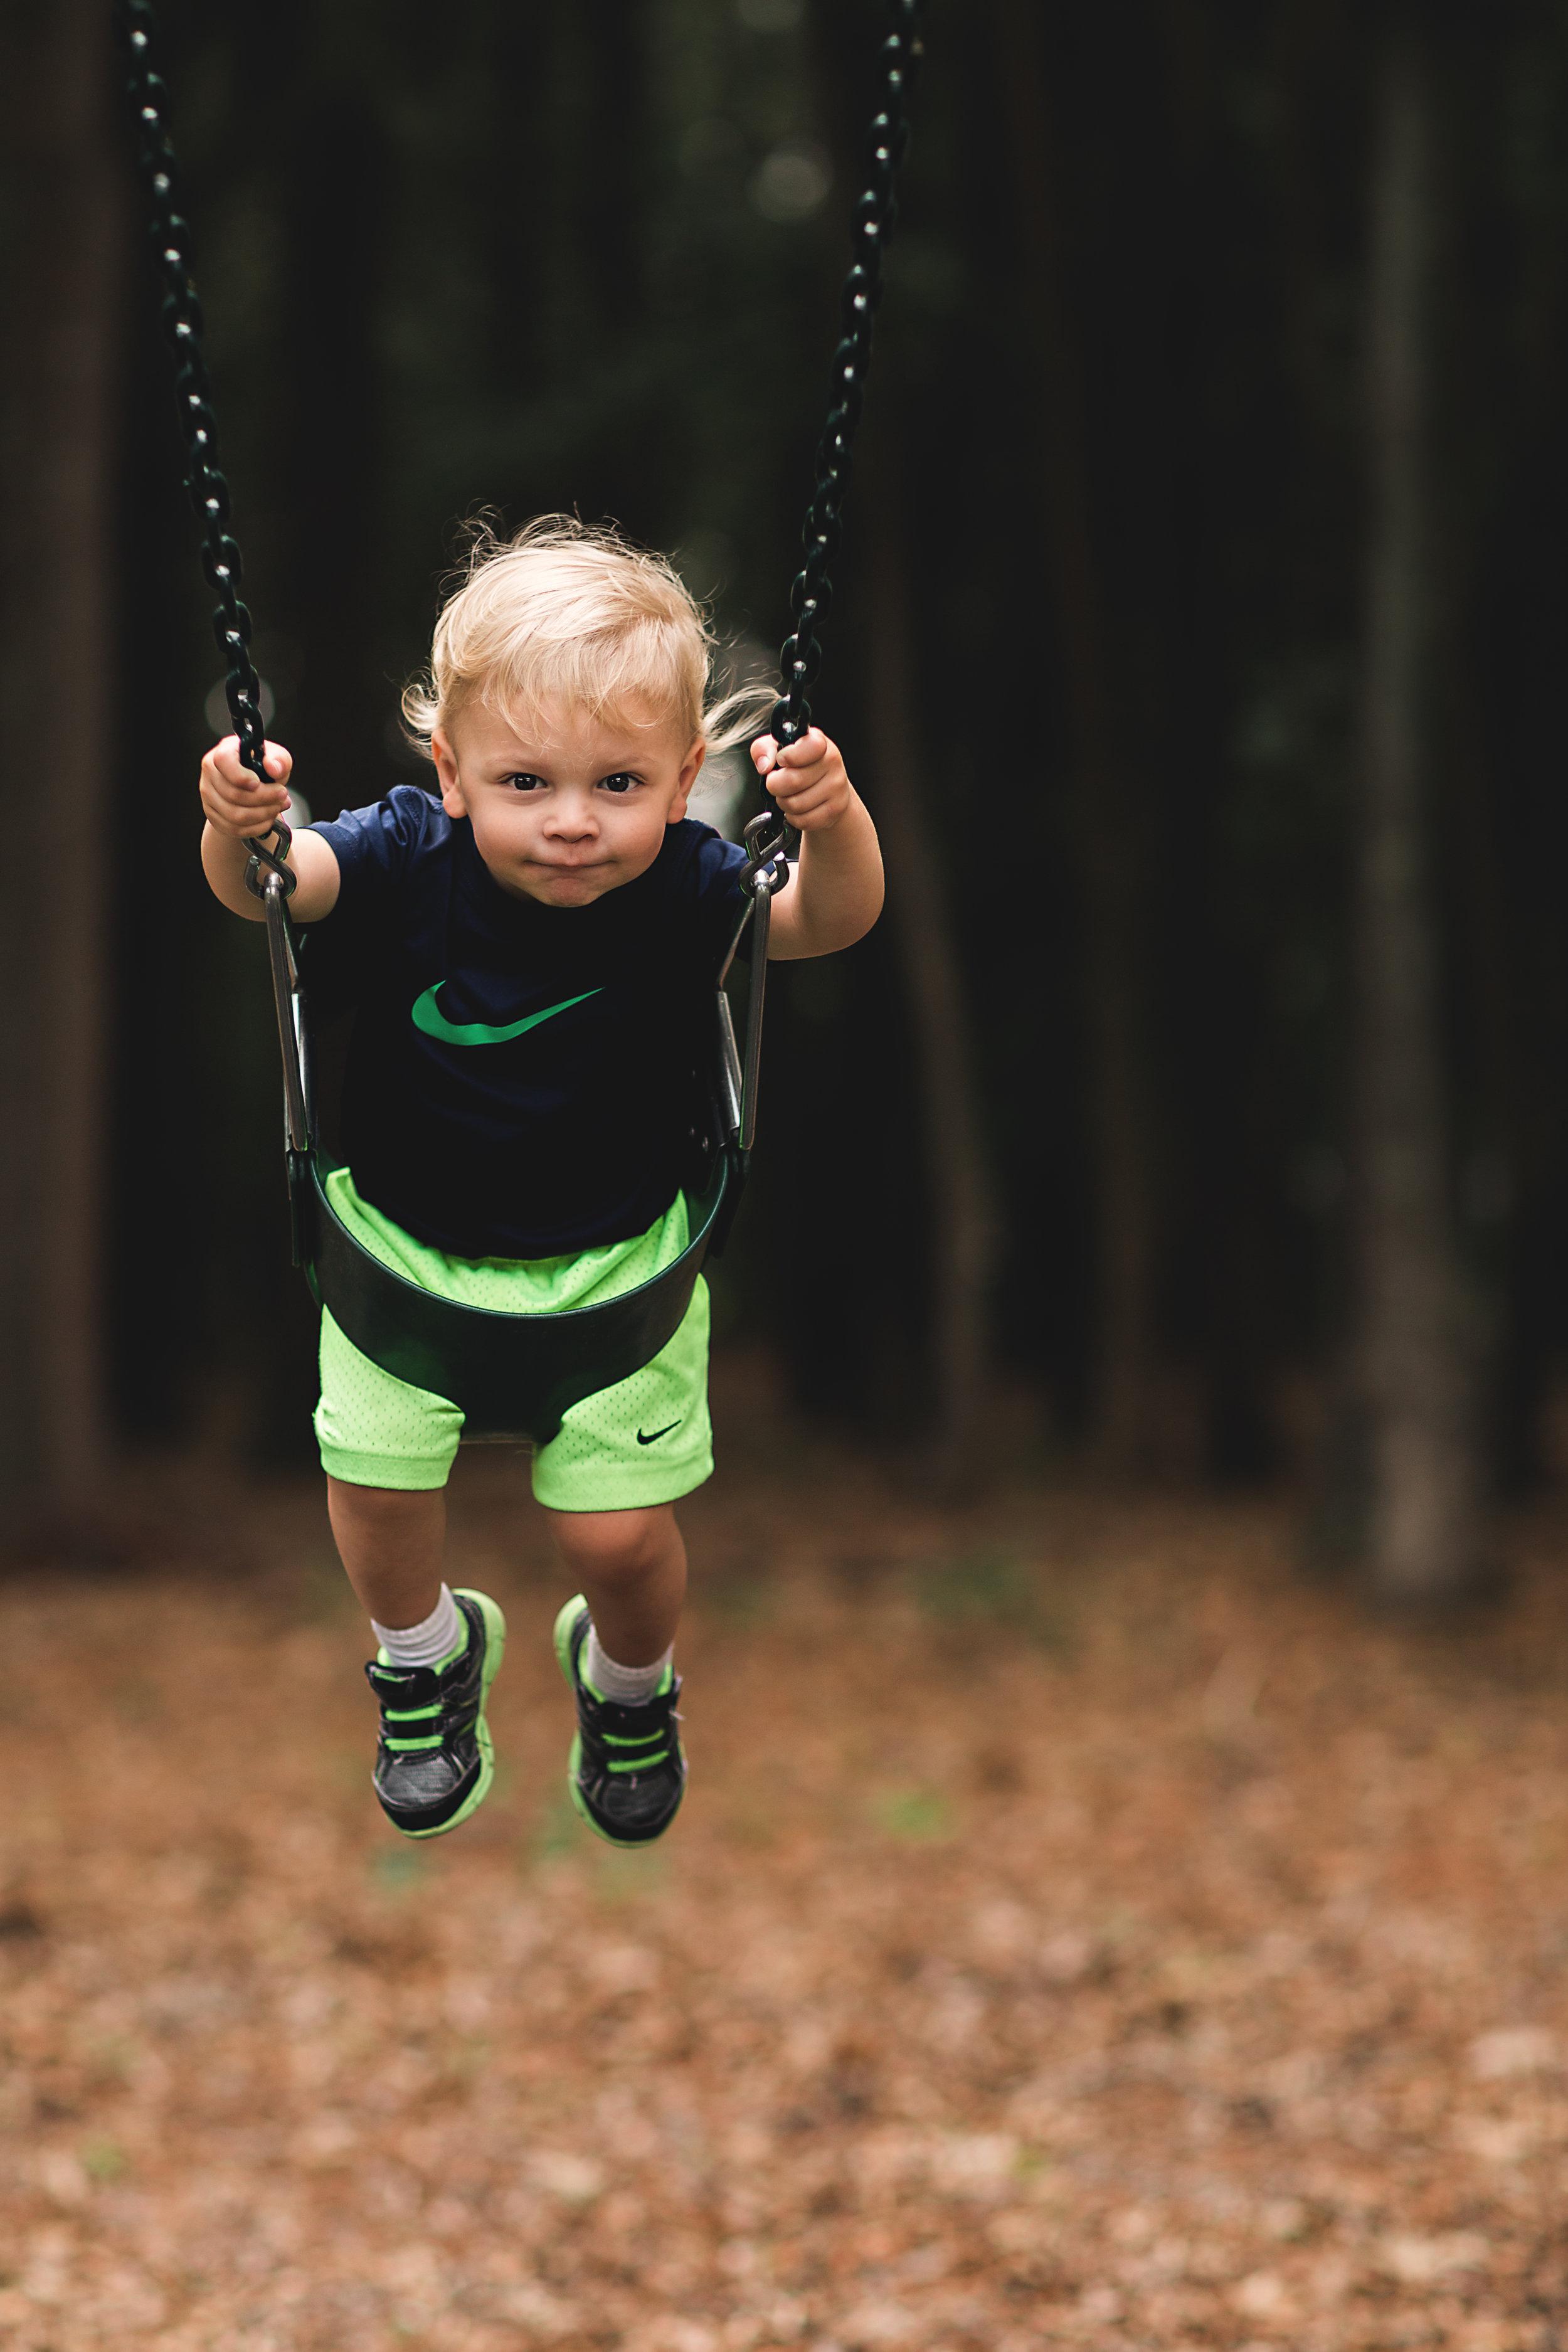 Hello-olivia-photography-Long-island-photography-children-session-family-lifestyle-matthew-swing.jpg